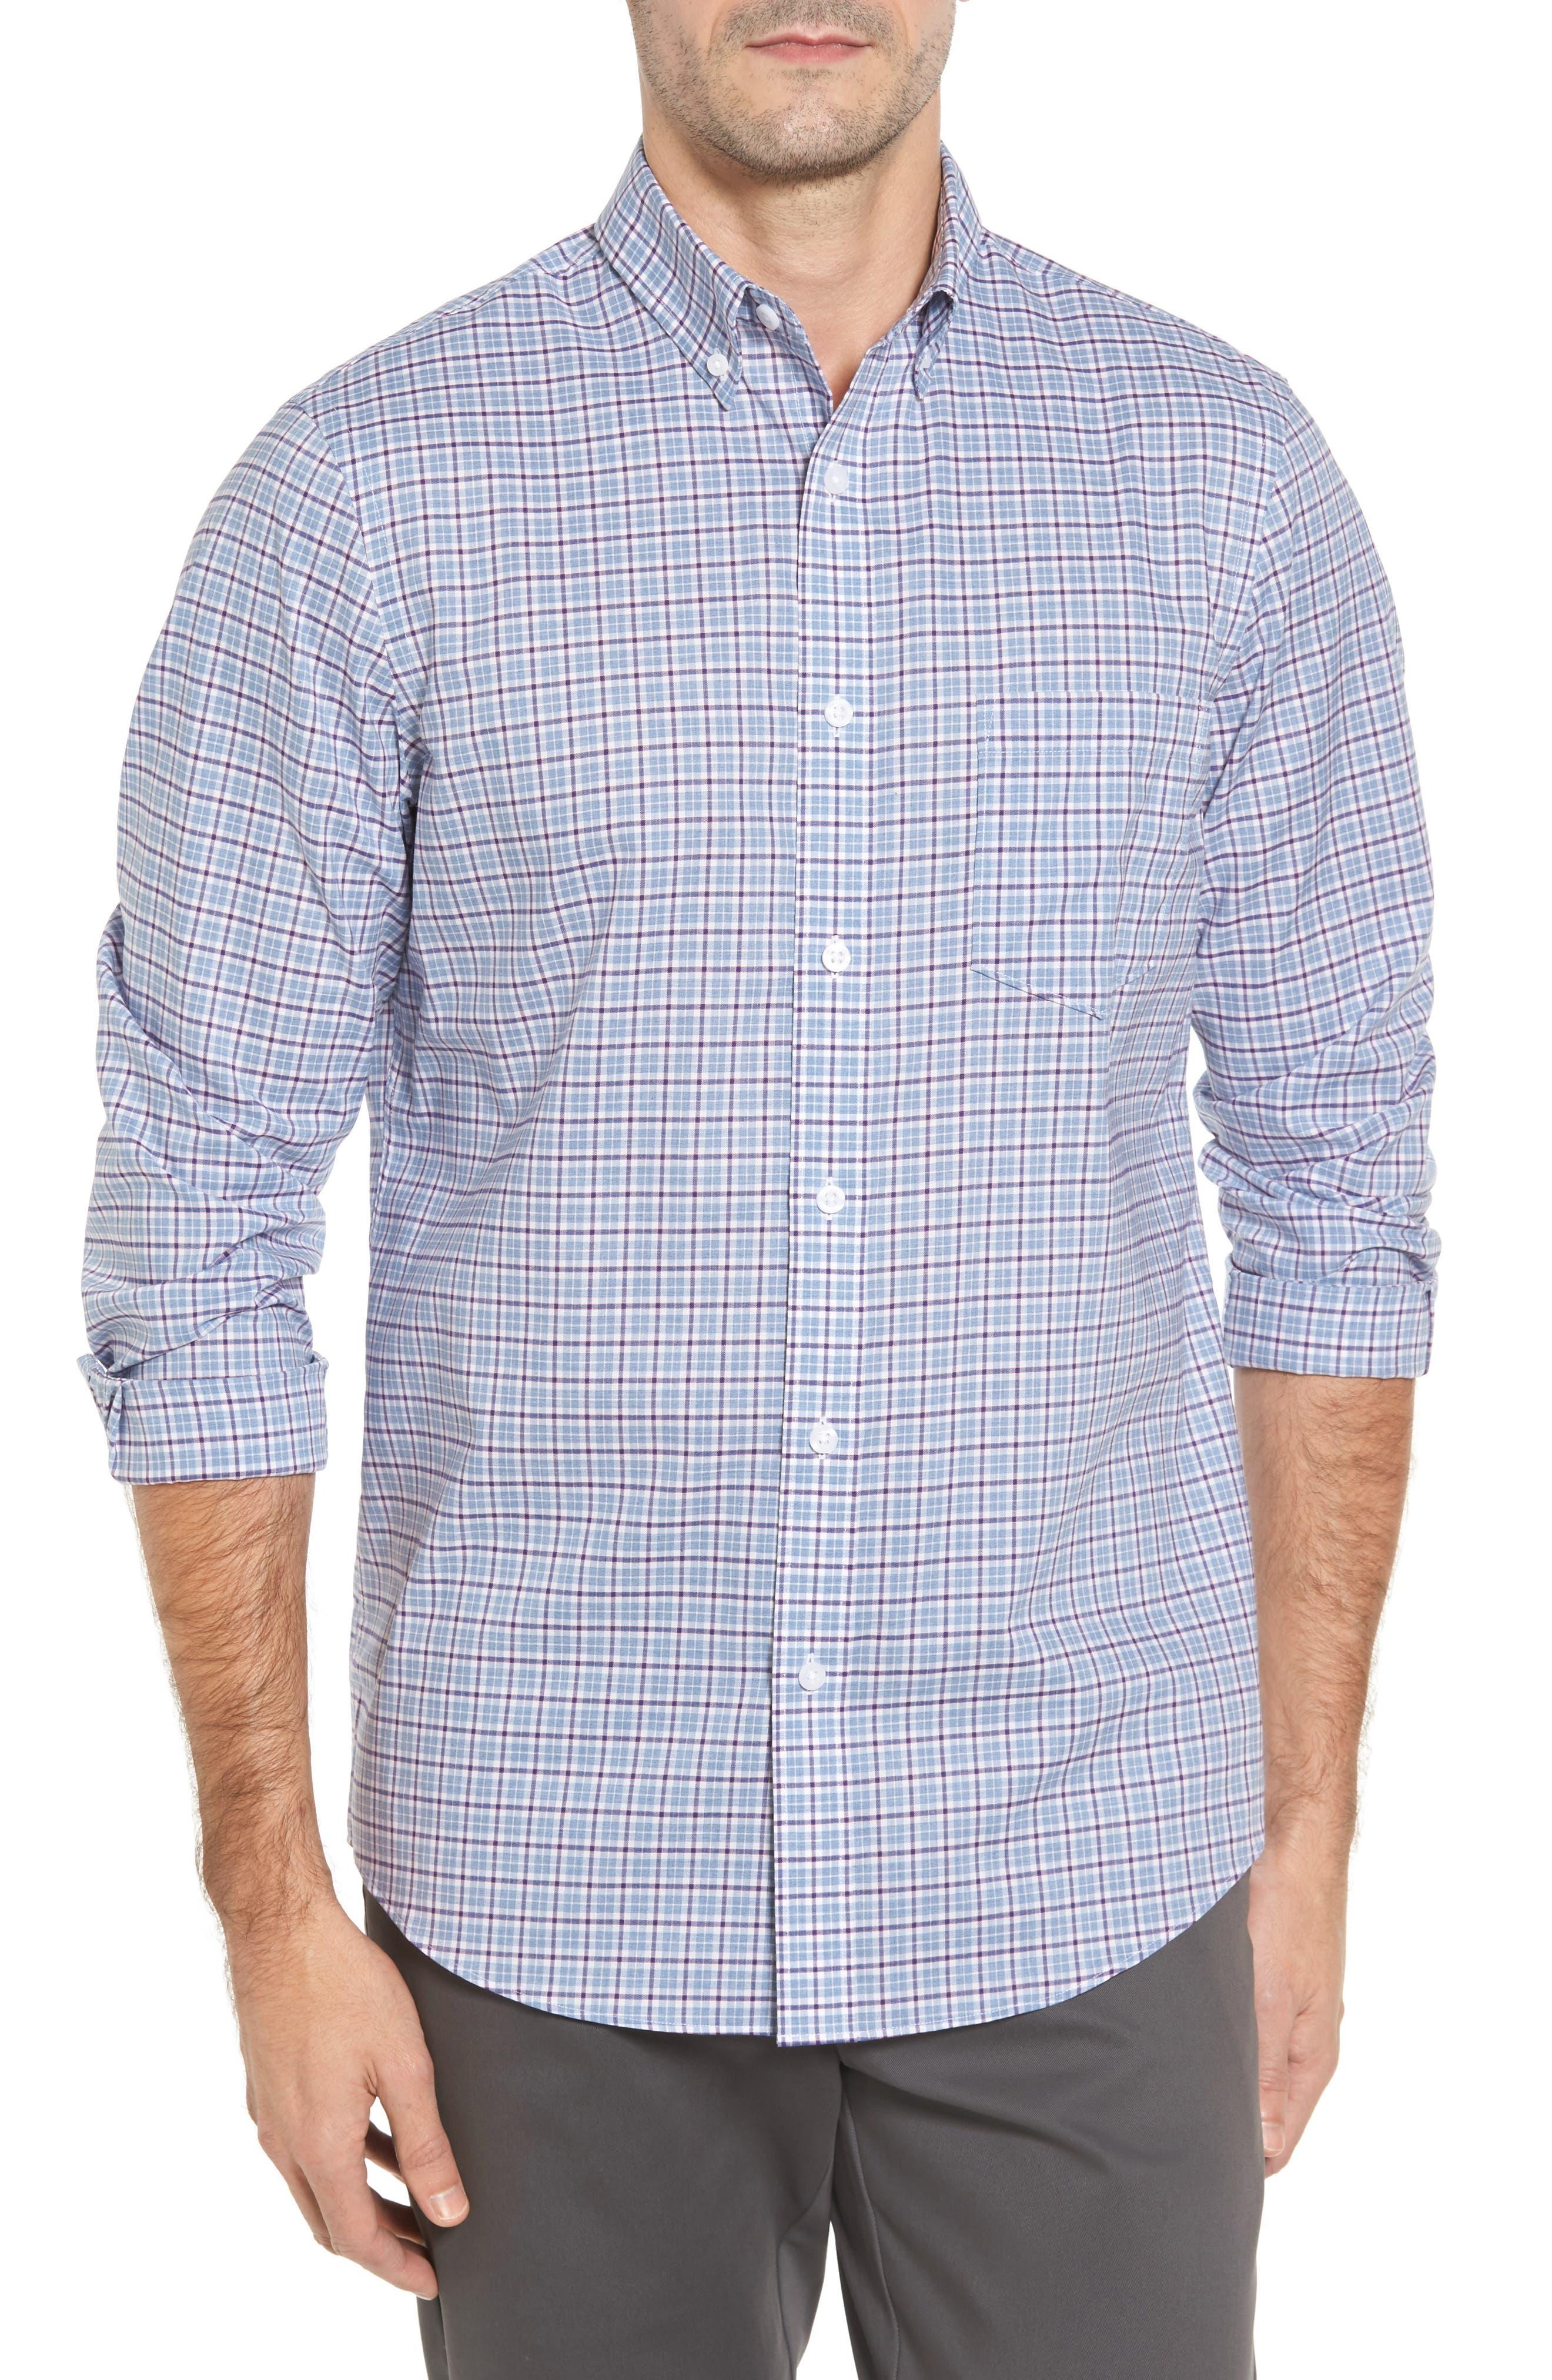 Alternate Image 1 Selected - Nordstrom Men's Shop Non-Iron Regular Fit Check Sport Shirt